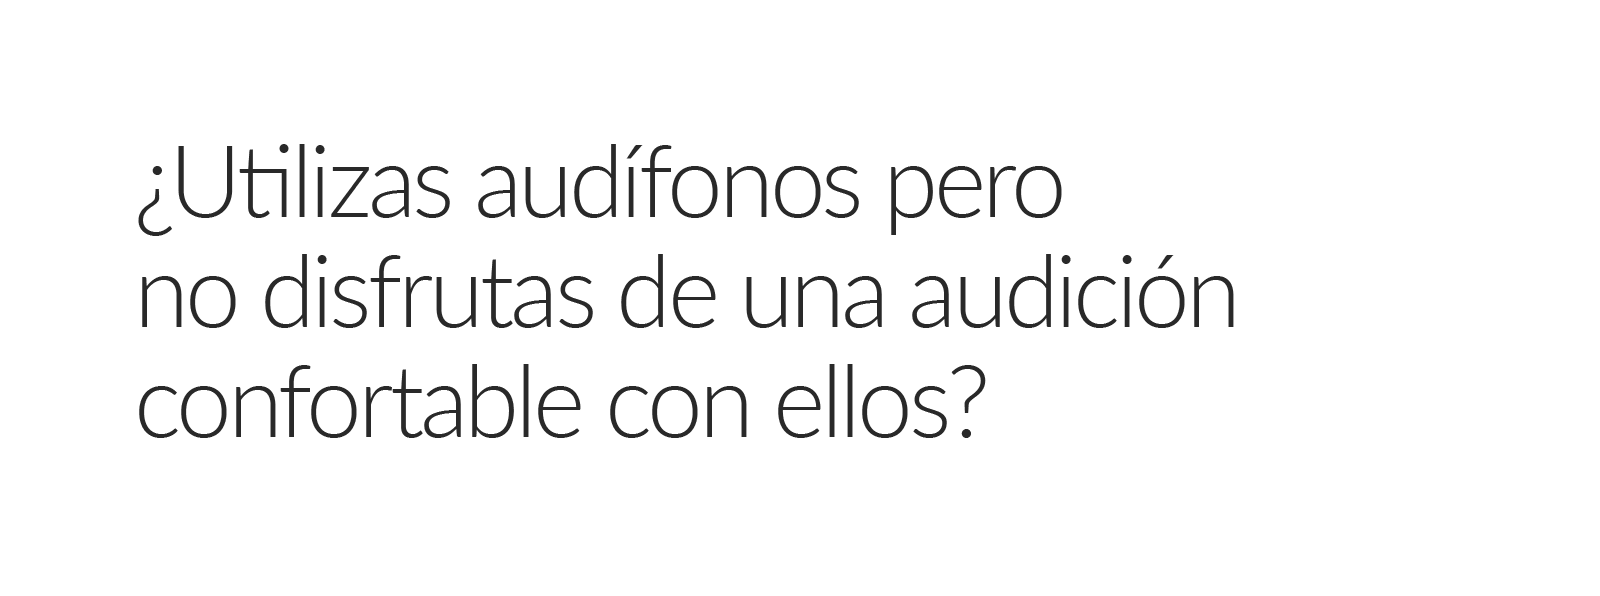 Utilizas audífonos